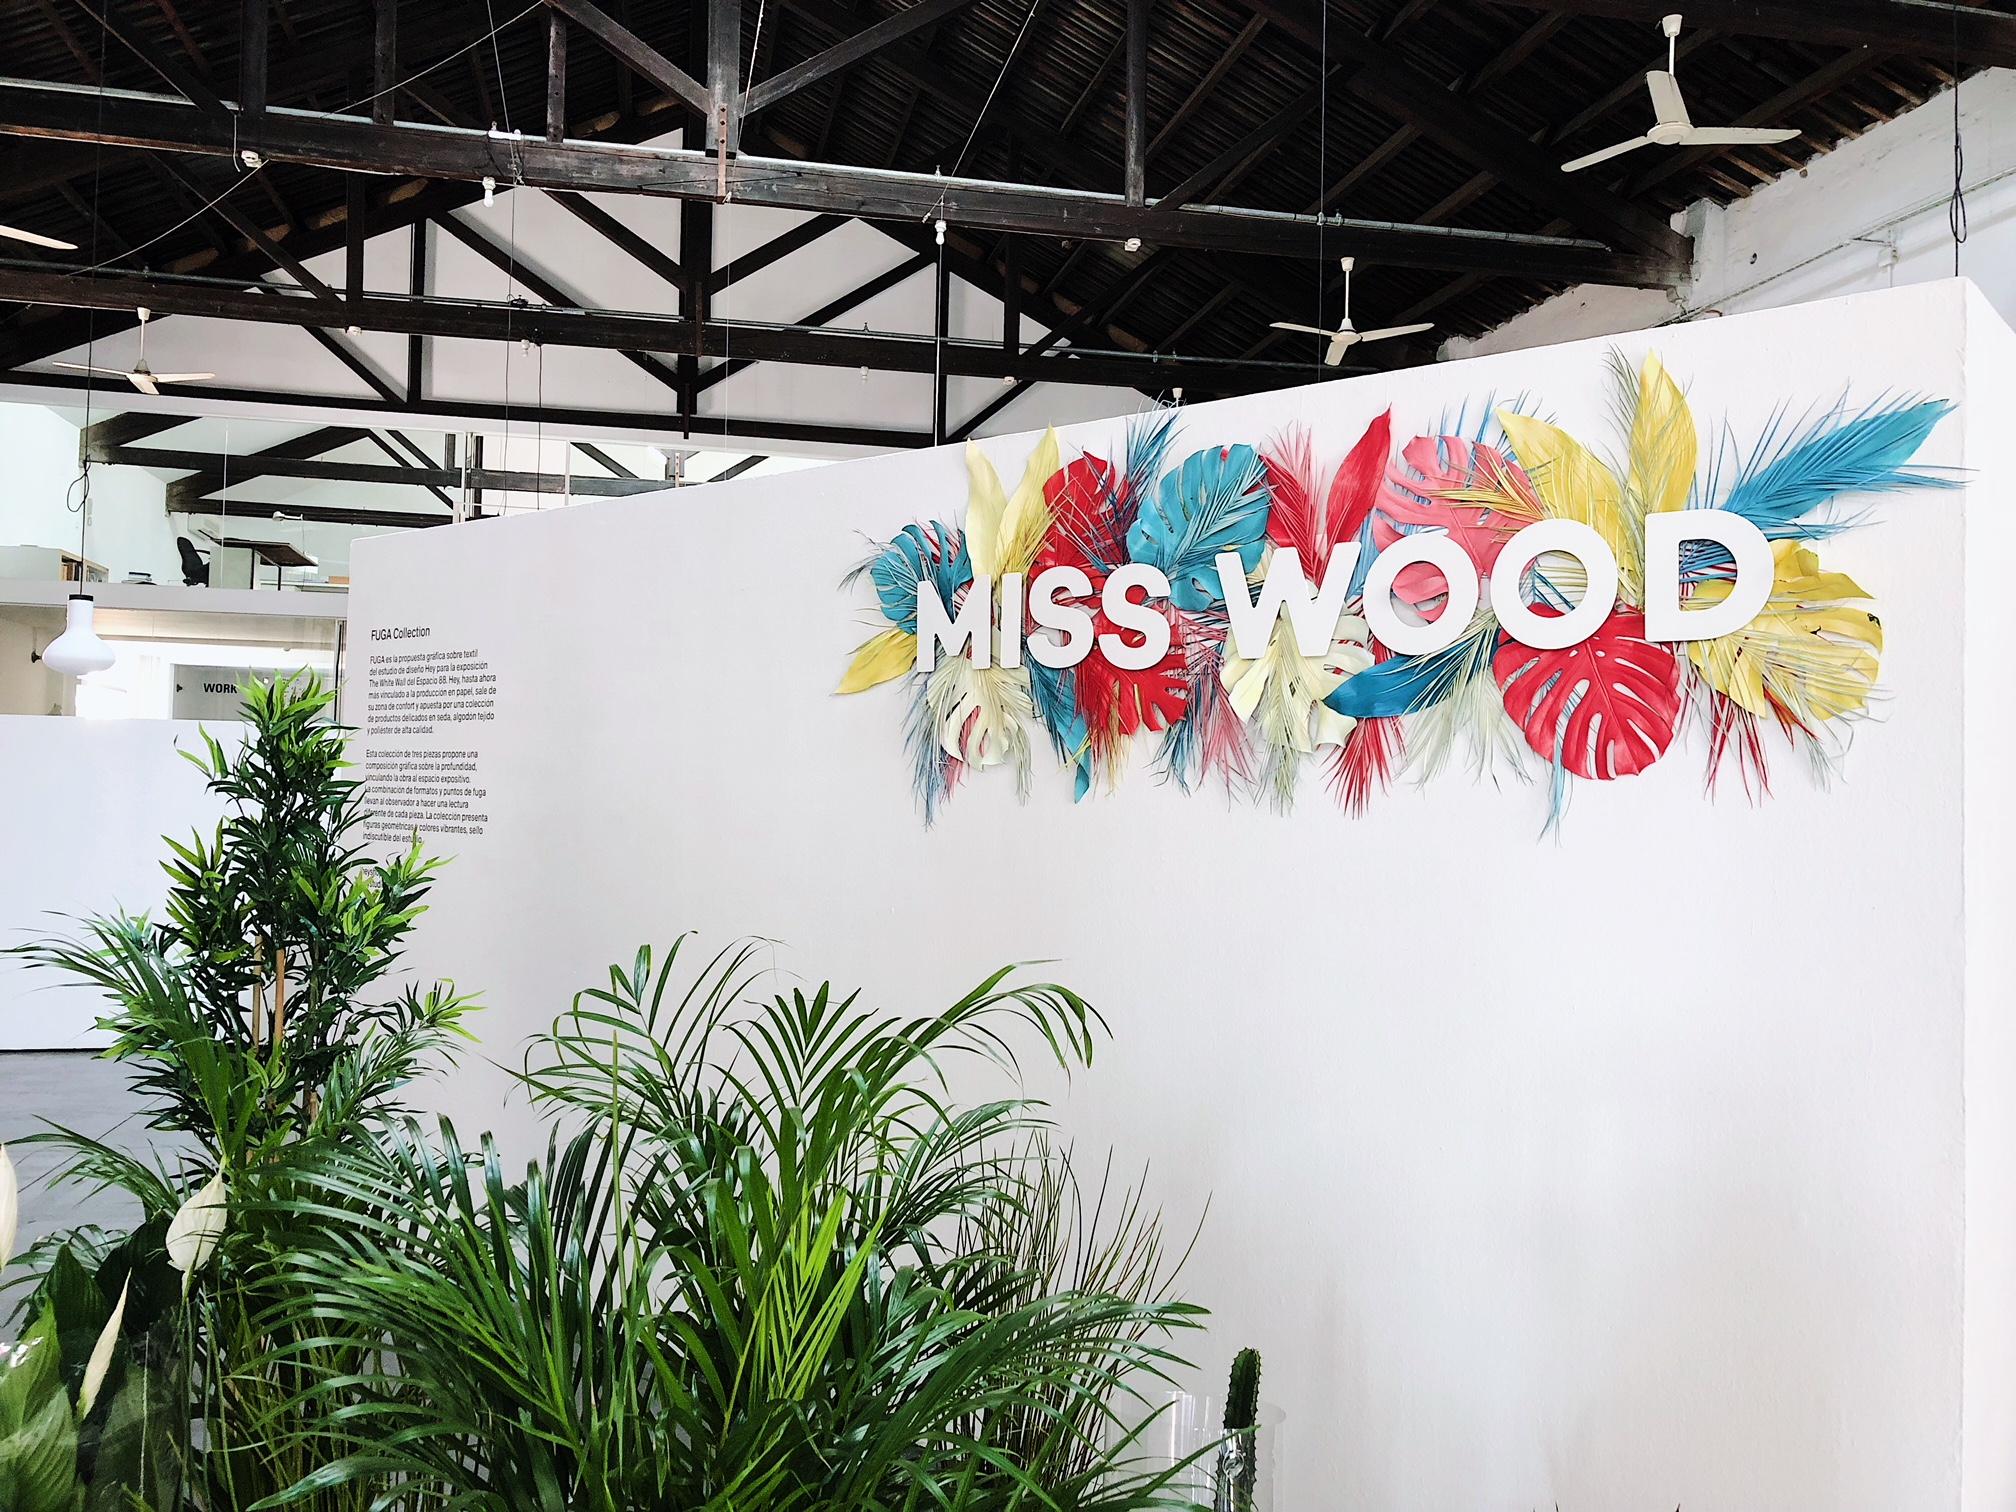 misswood-eventos-27lletres-03.JPG